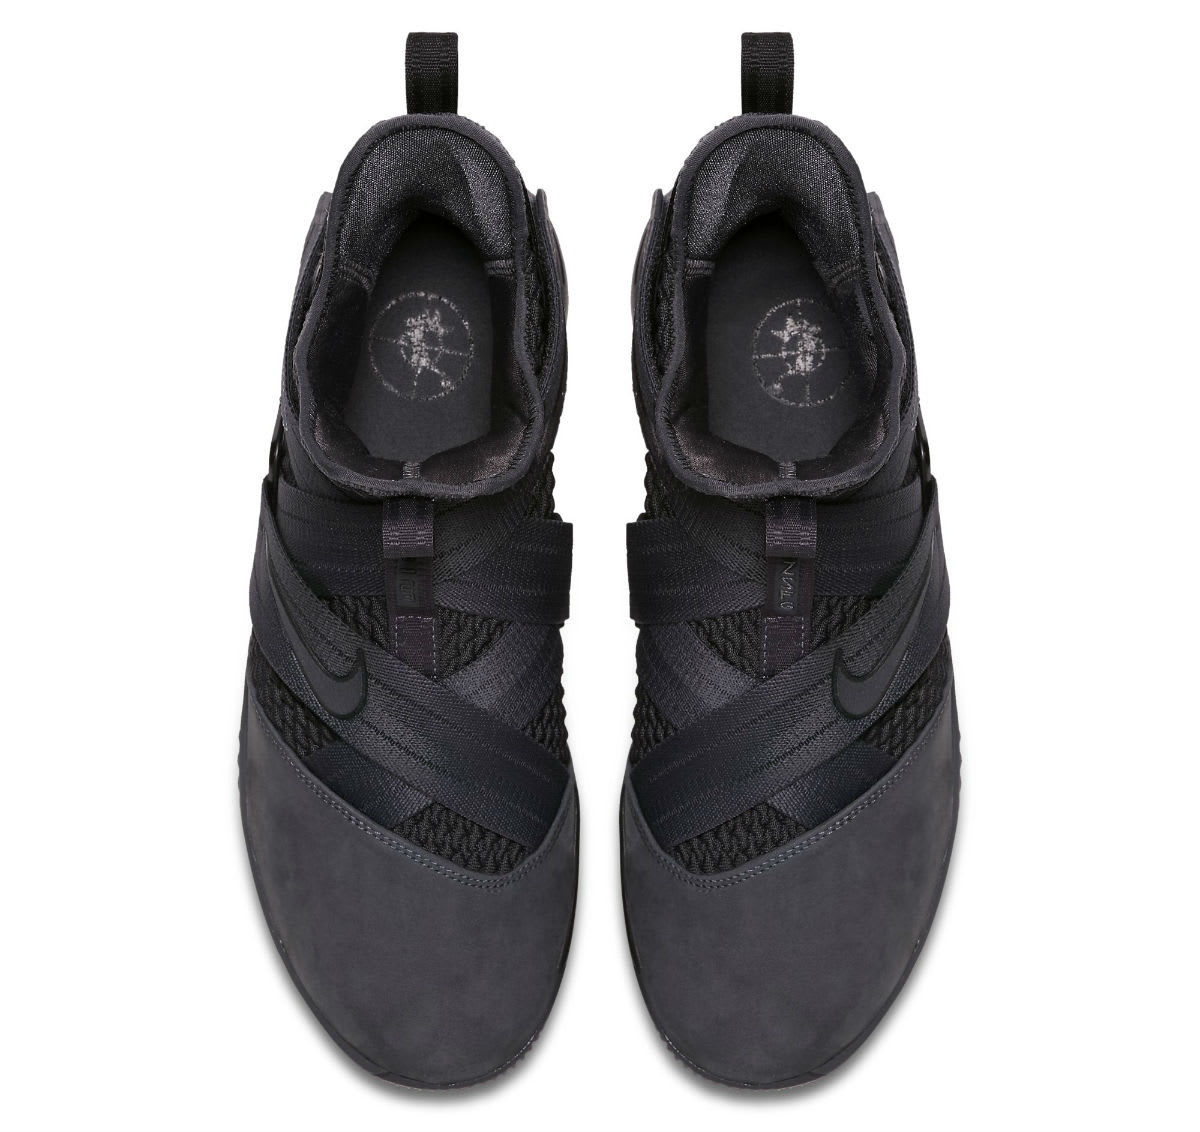 Nike LeBron Soldier 12 XII Zero Dark Thirty Triple Black Release Date AO4054-002 Top